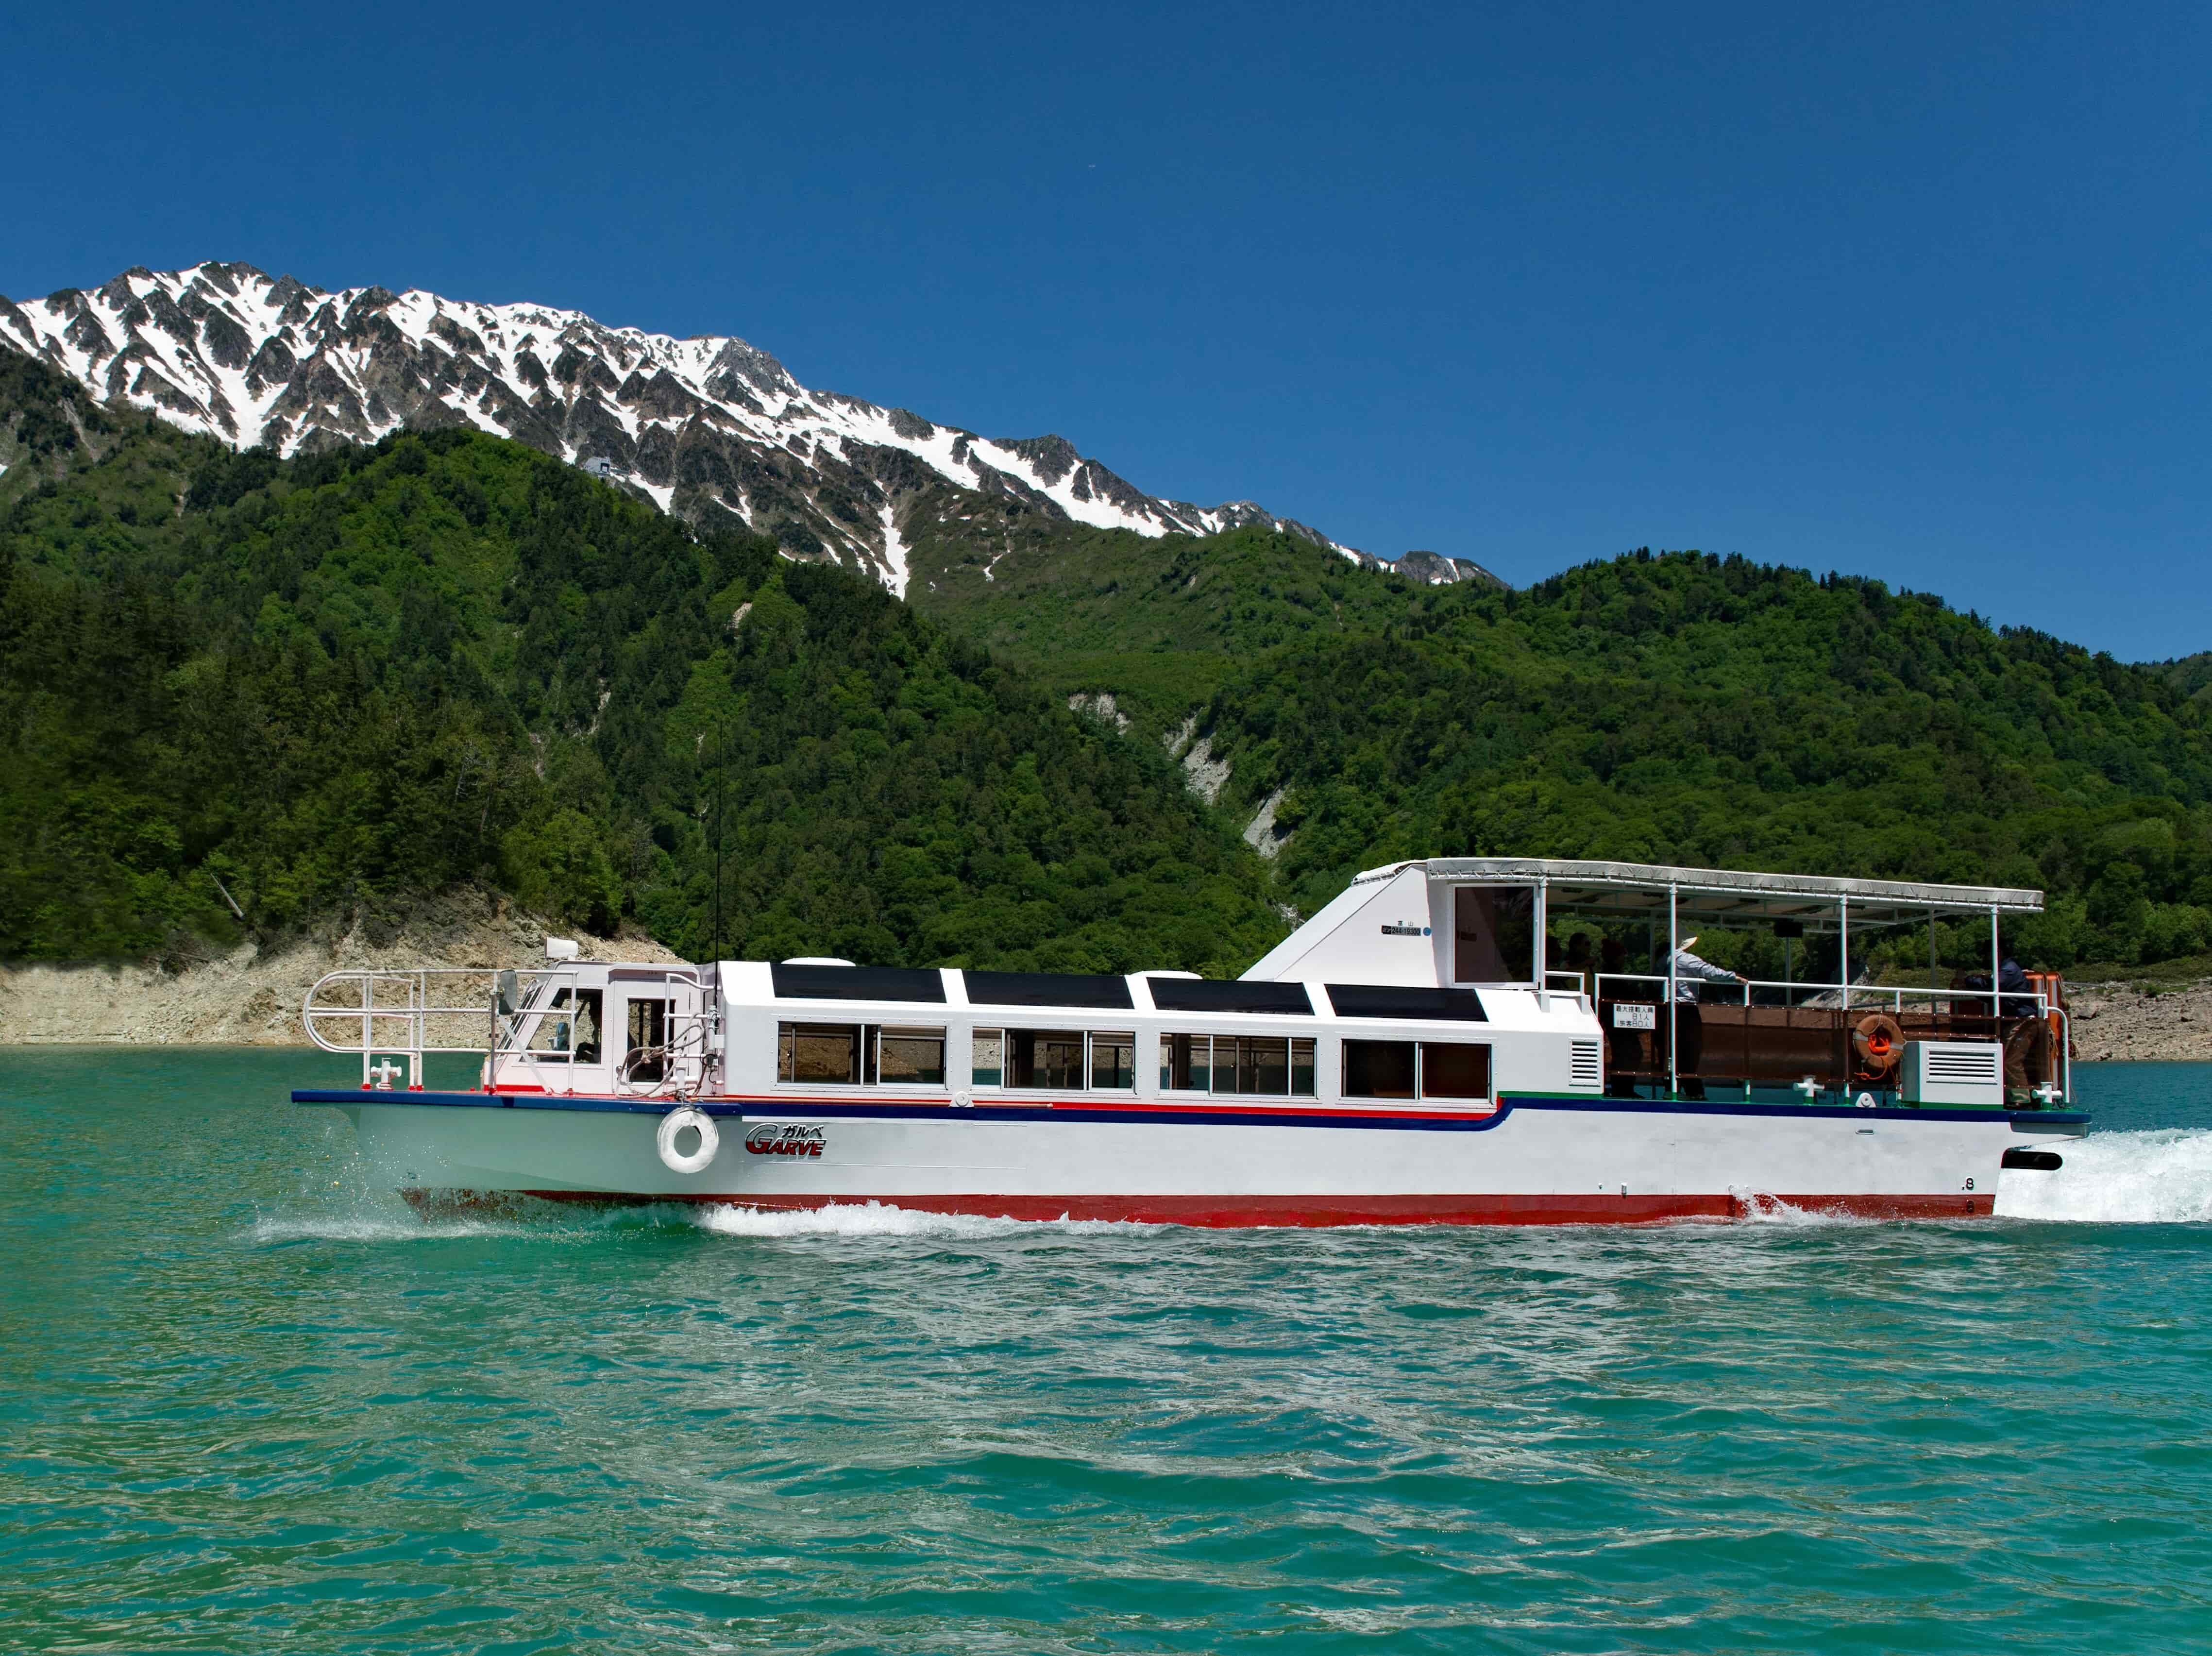 Kurobe Dam & Cruise Ship GARUBE